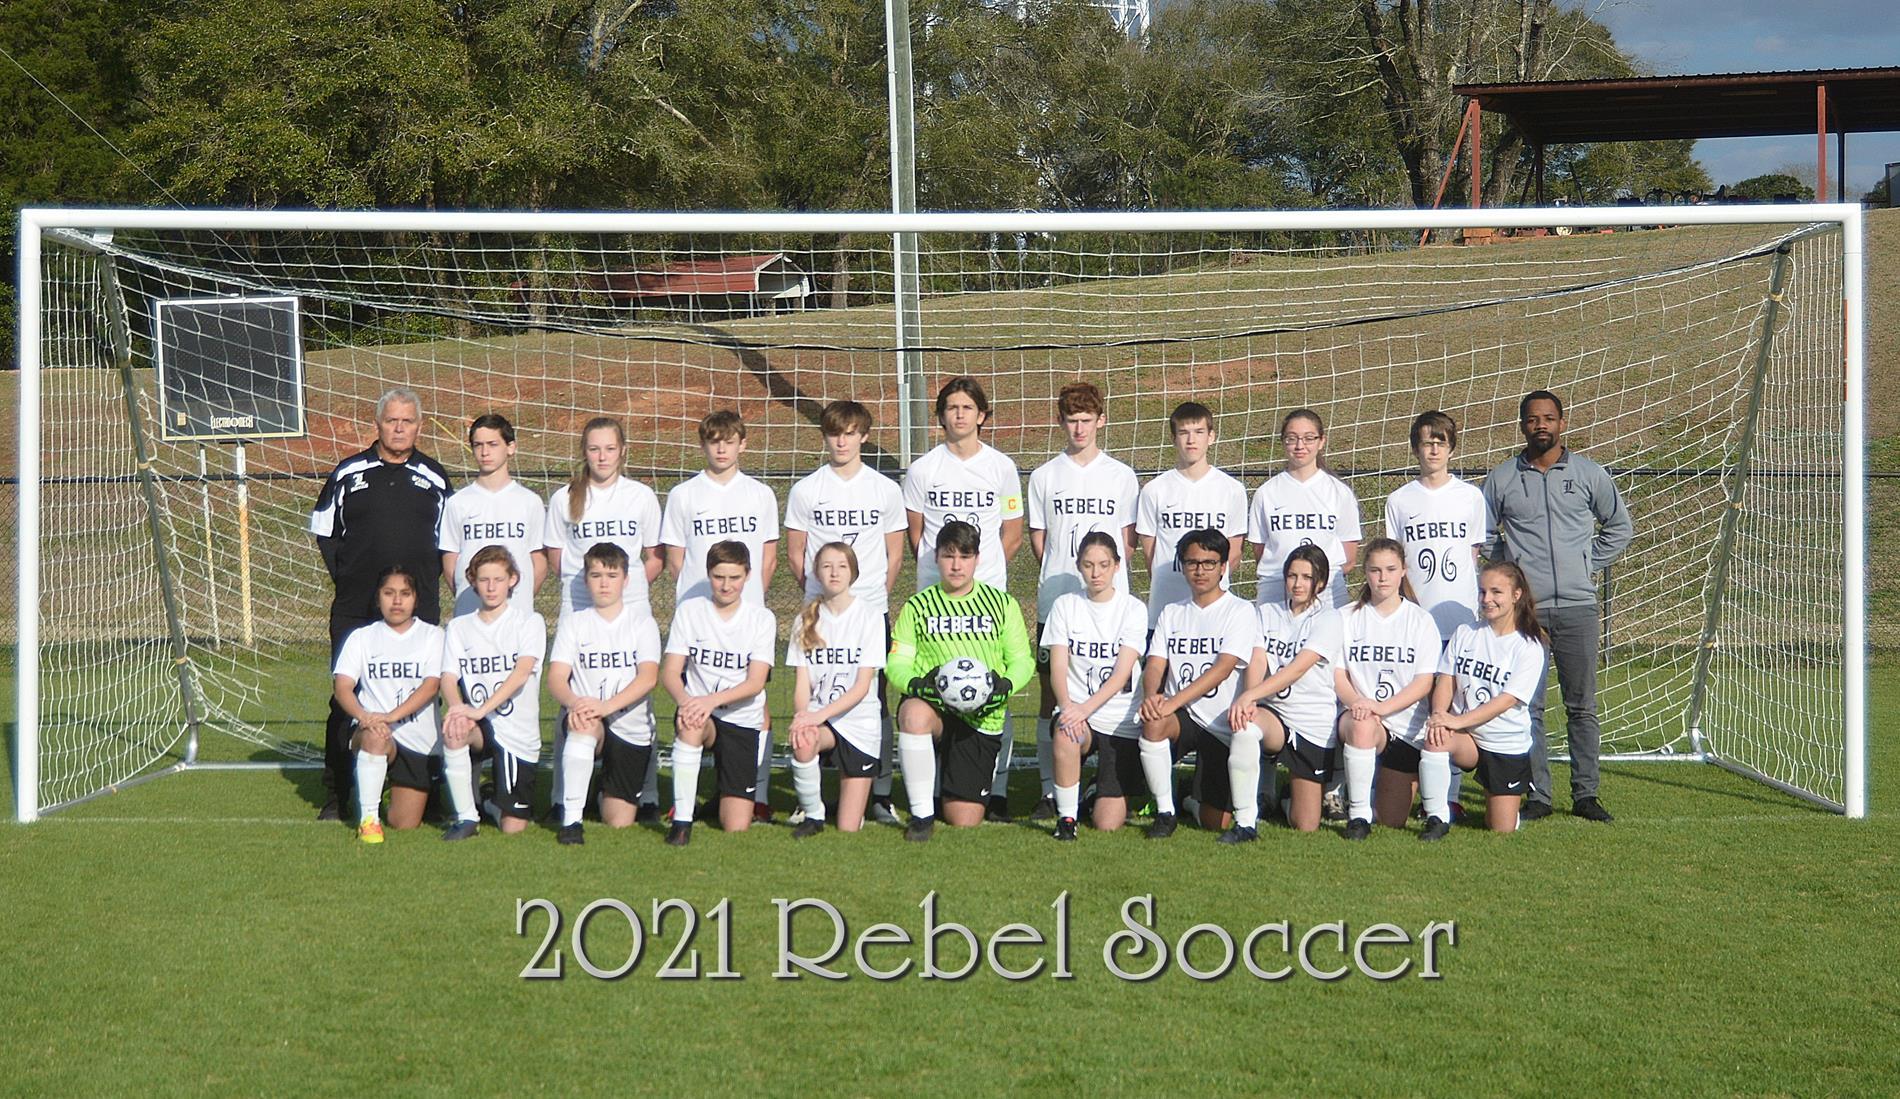 Rebel Soccer Team Picture